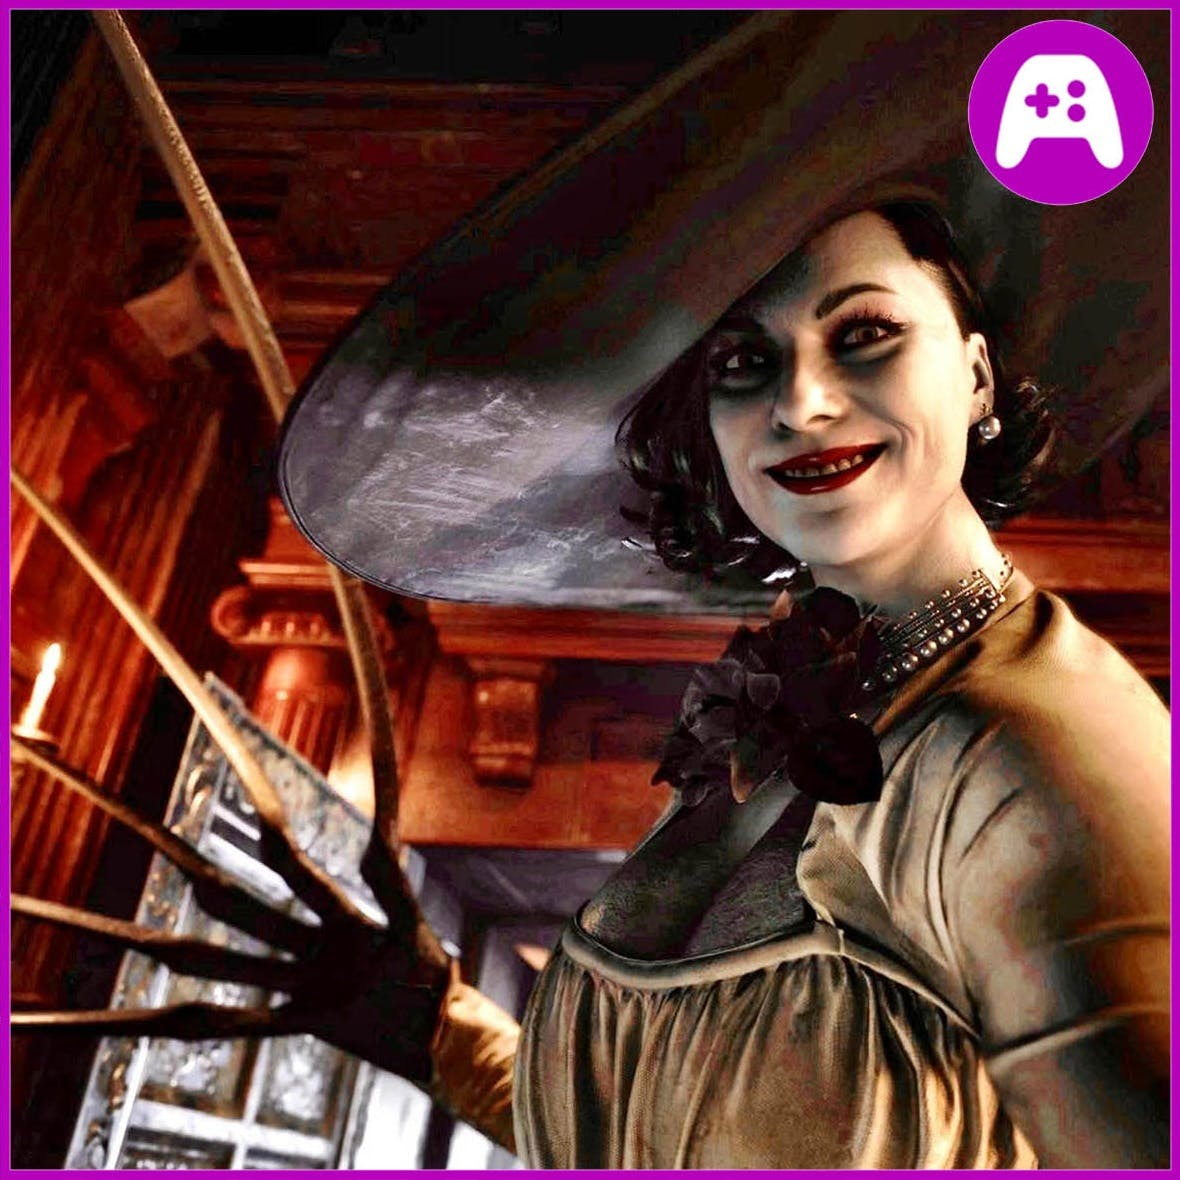 Resident Evil Village Gameplay Reveal - Ep. 218